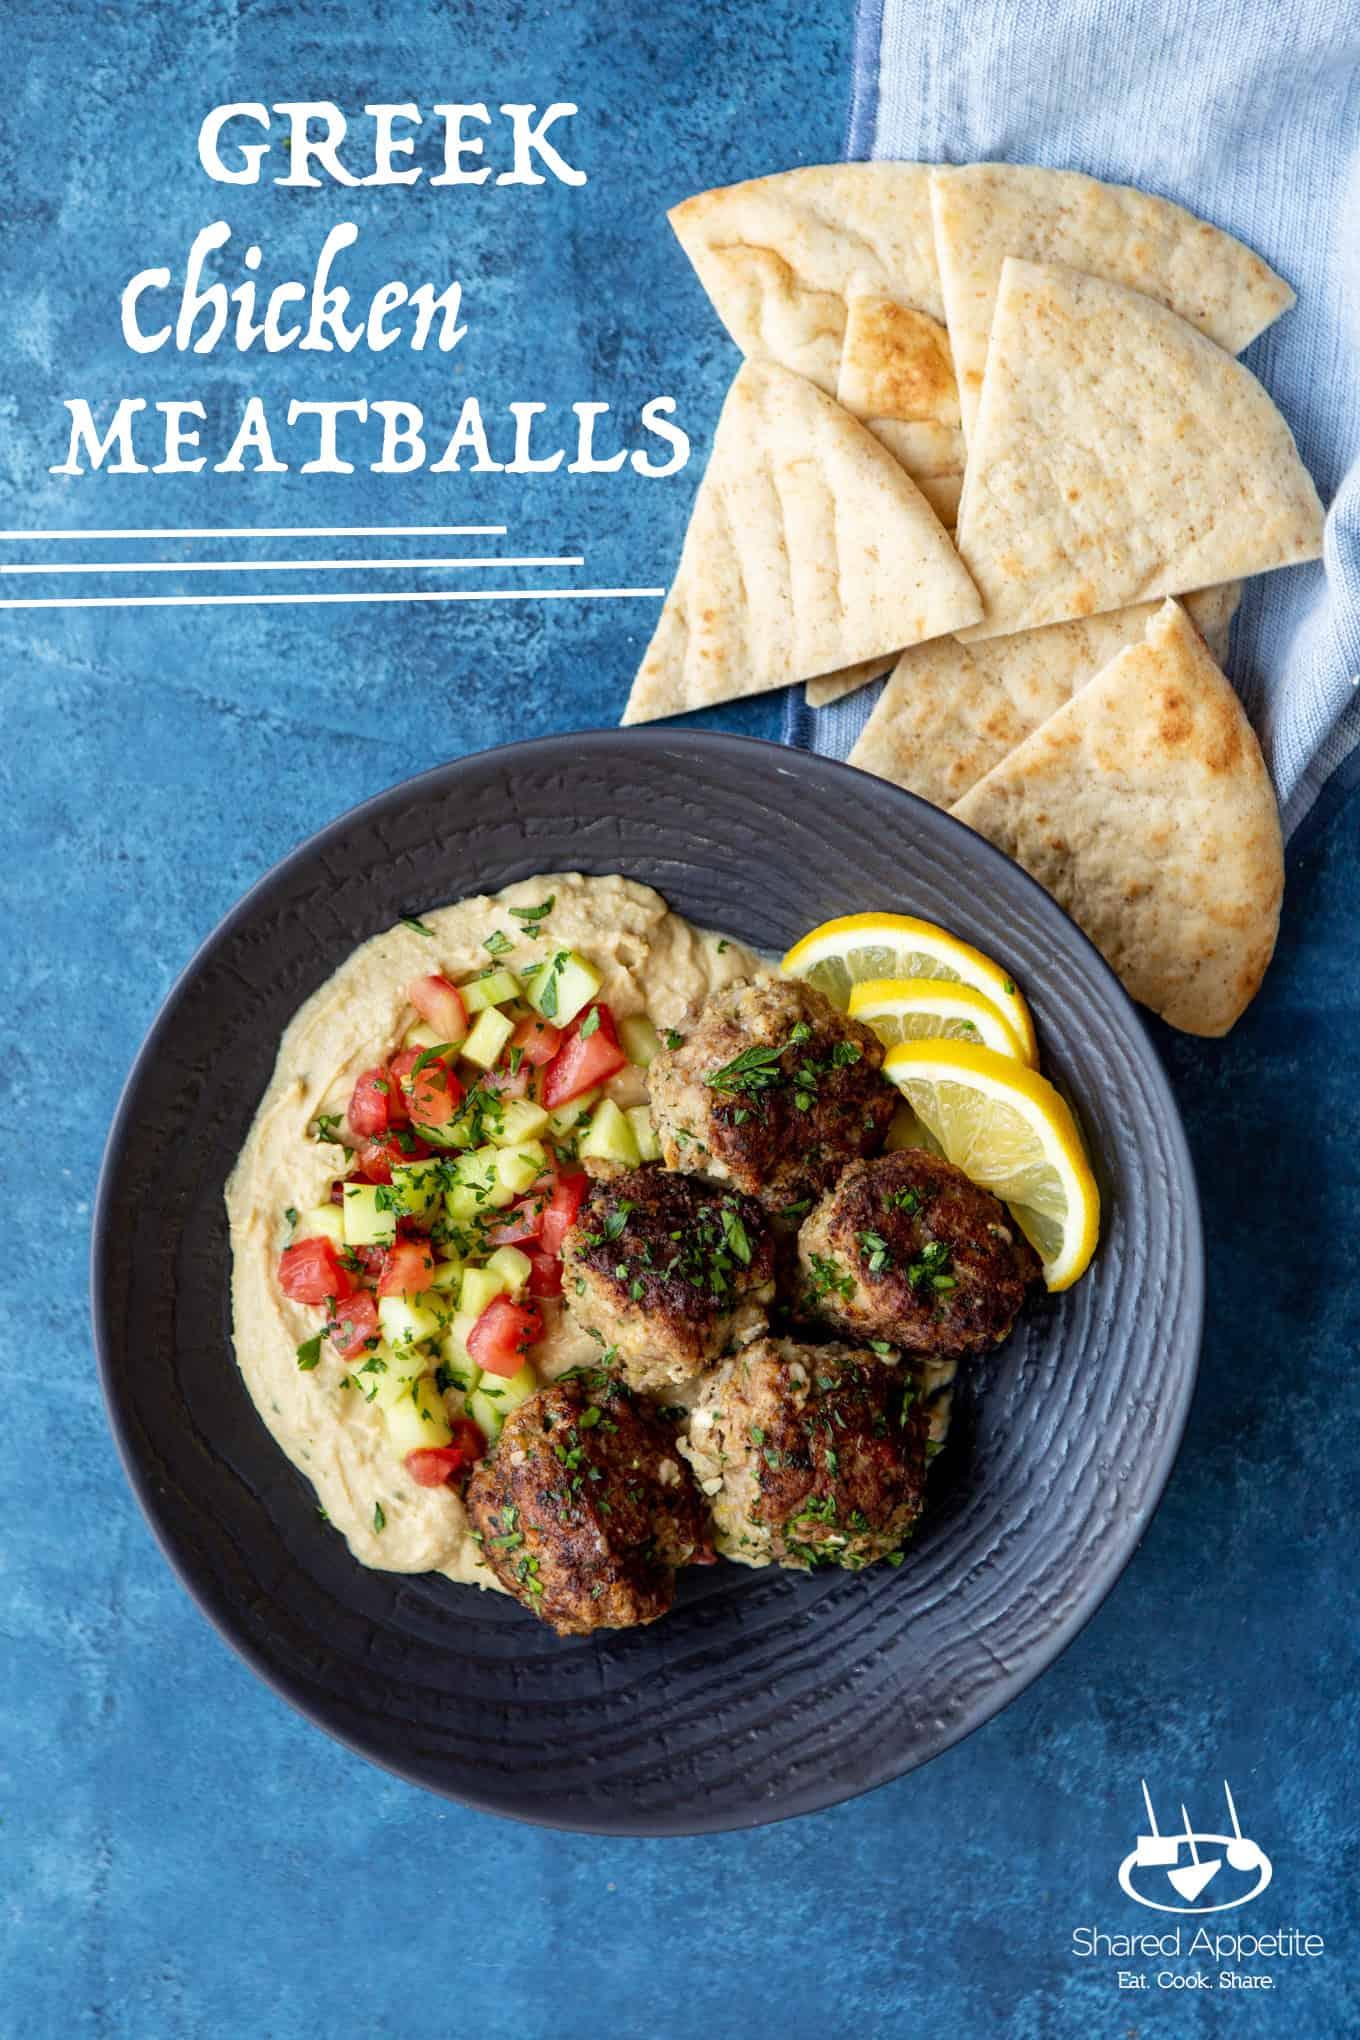 Greek Chicken Meatballs with Hummus and Israeli Salad   sharedappetite.com